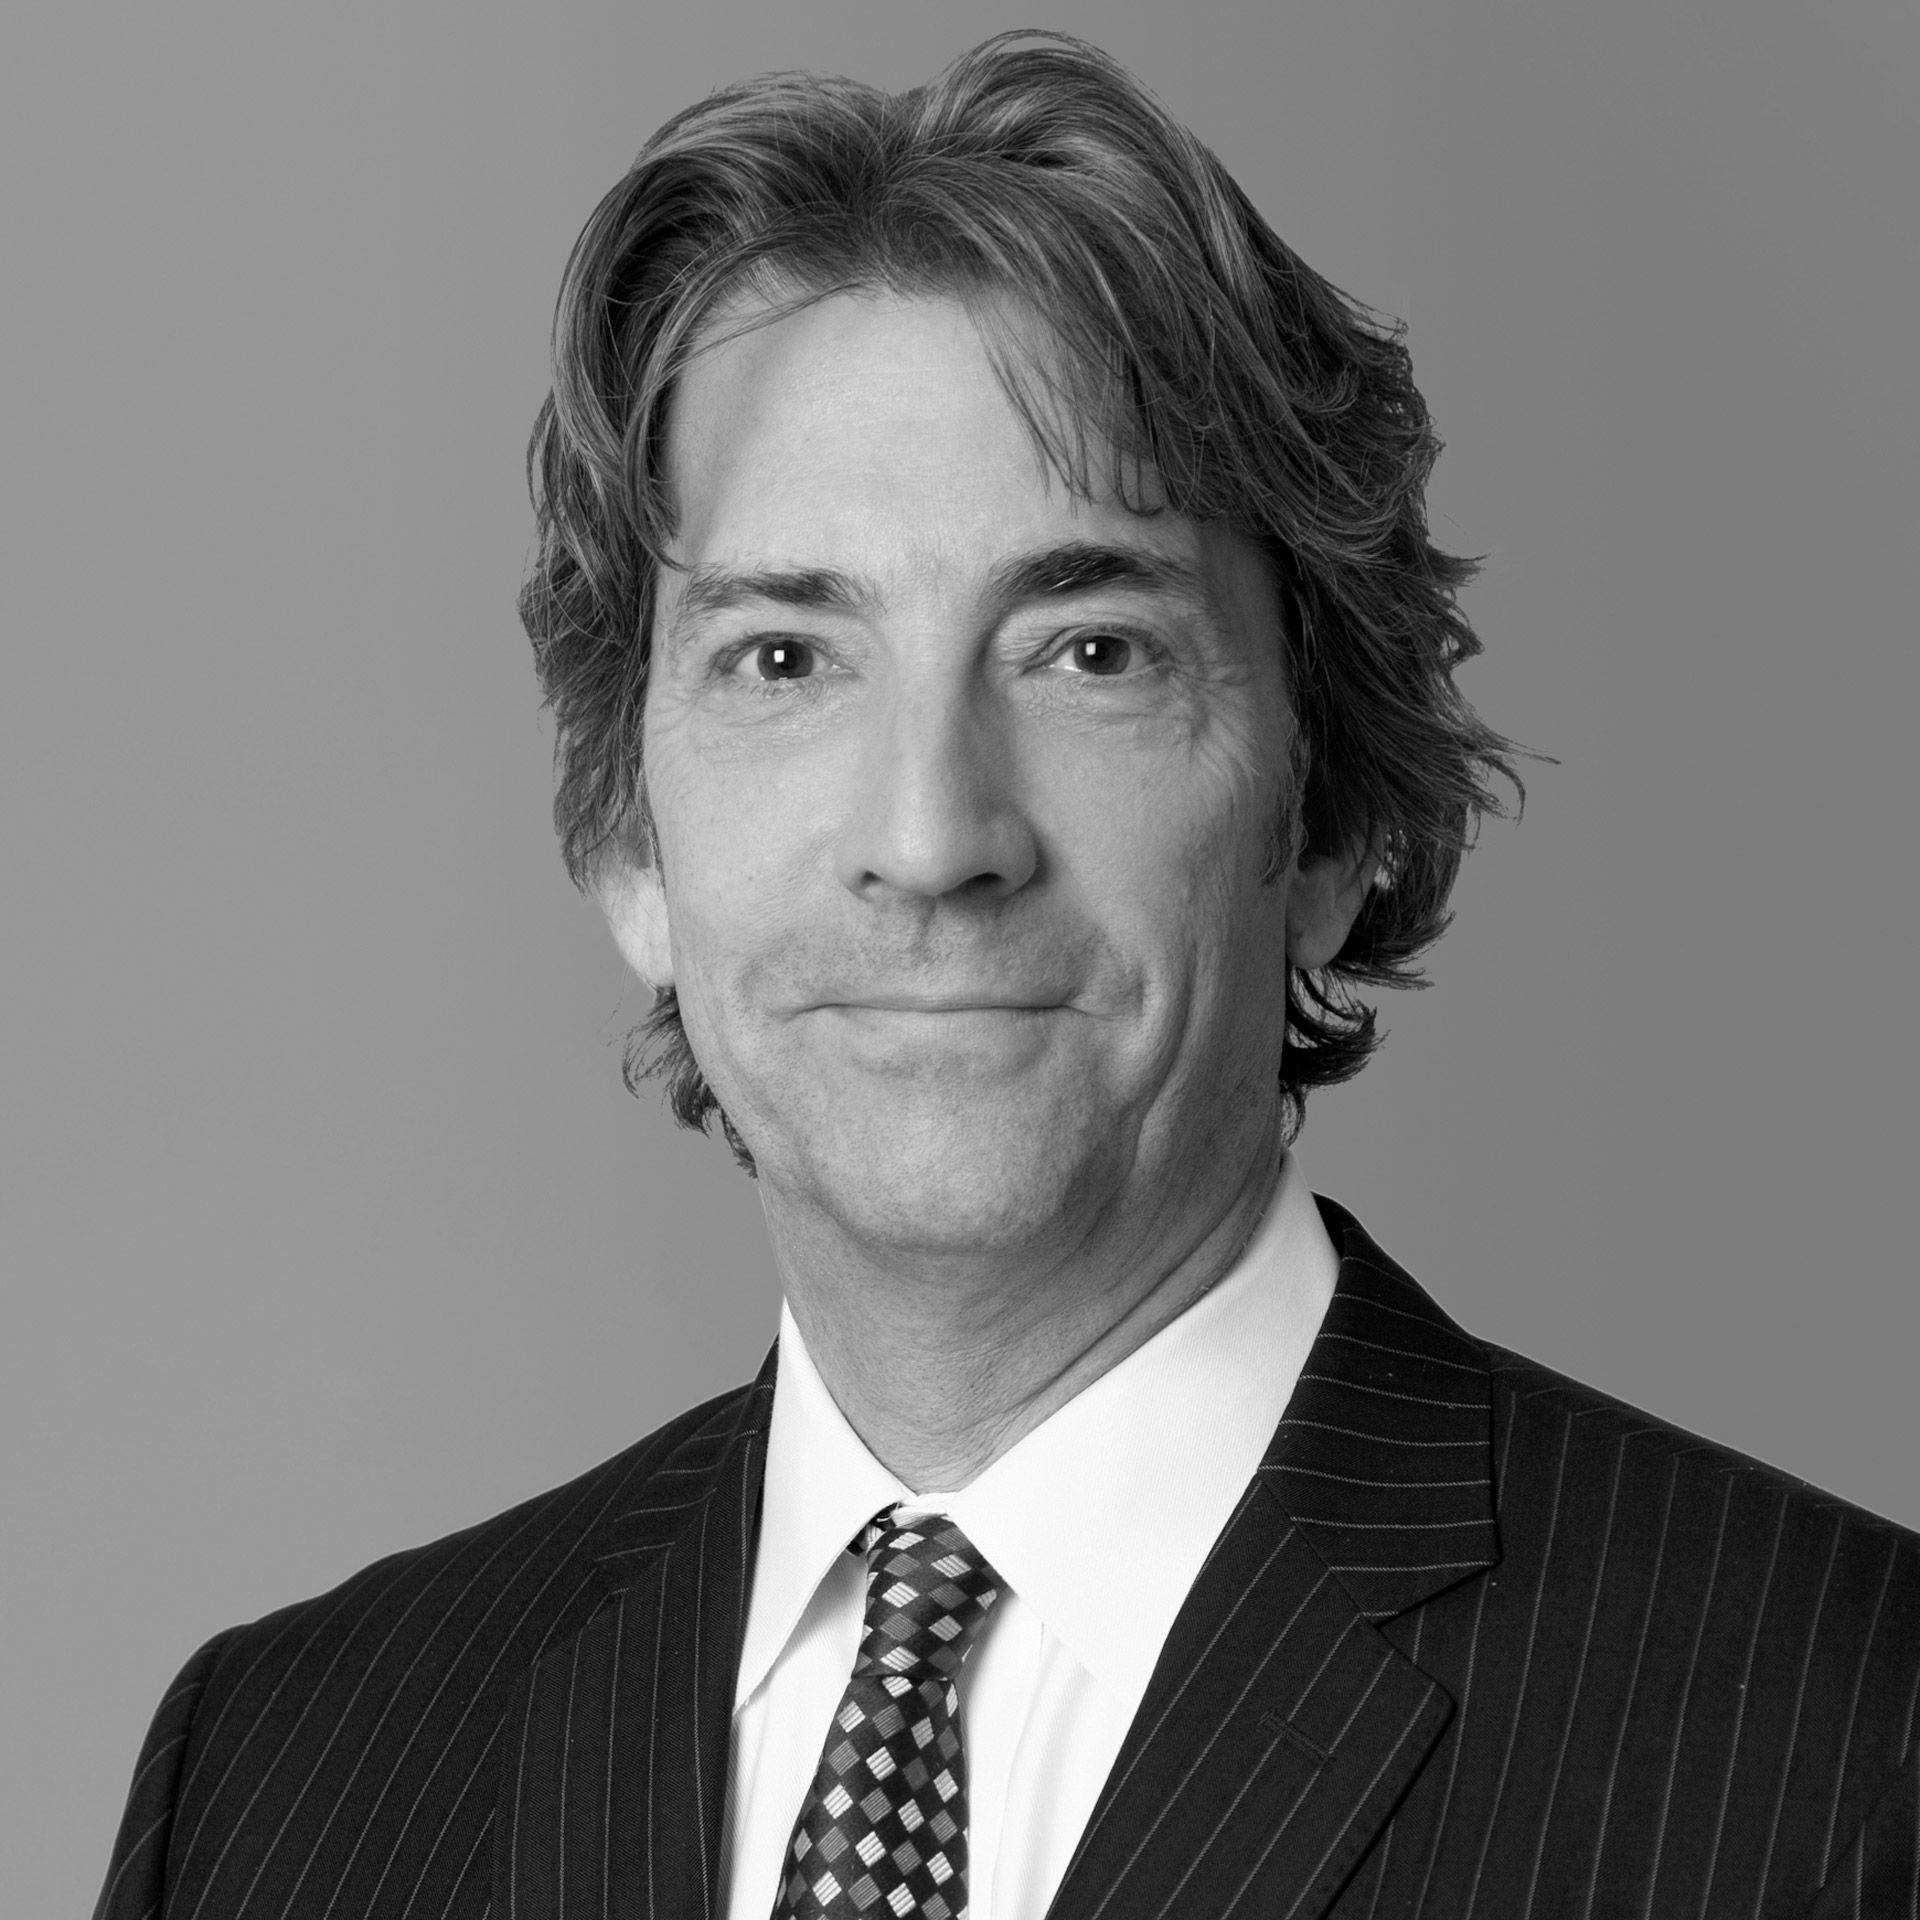 G. Pierre Lapointe